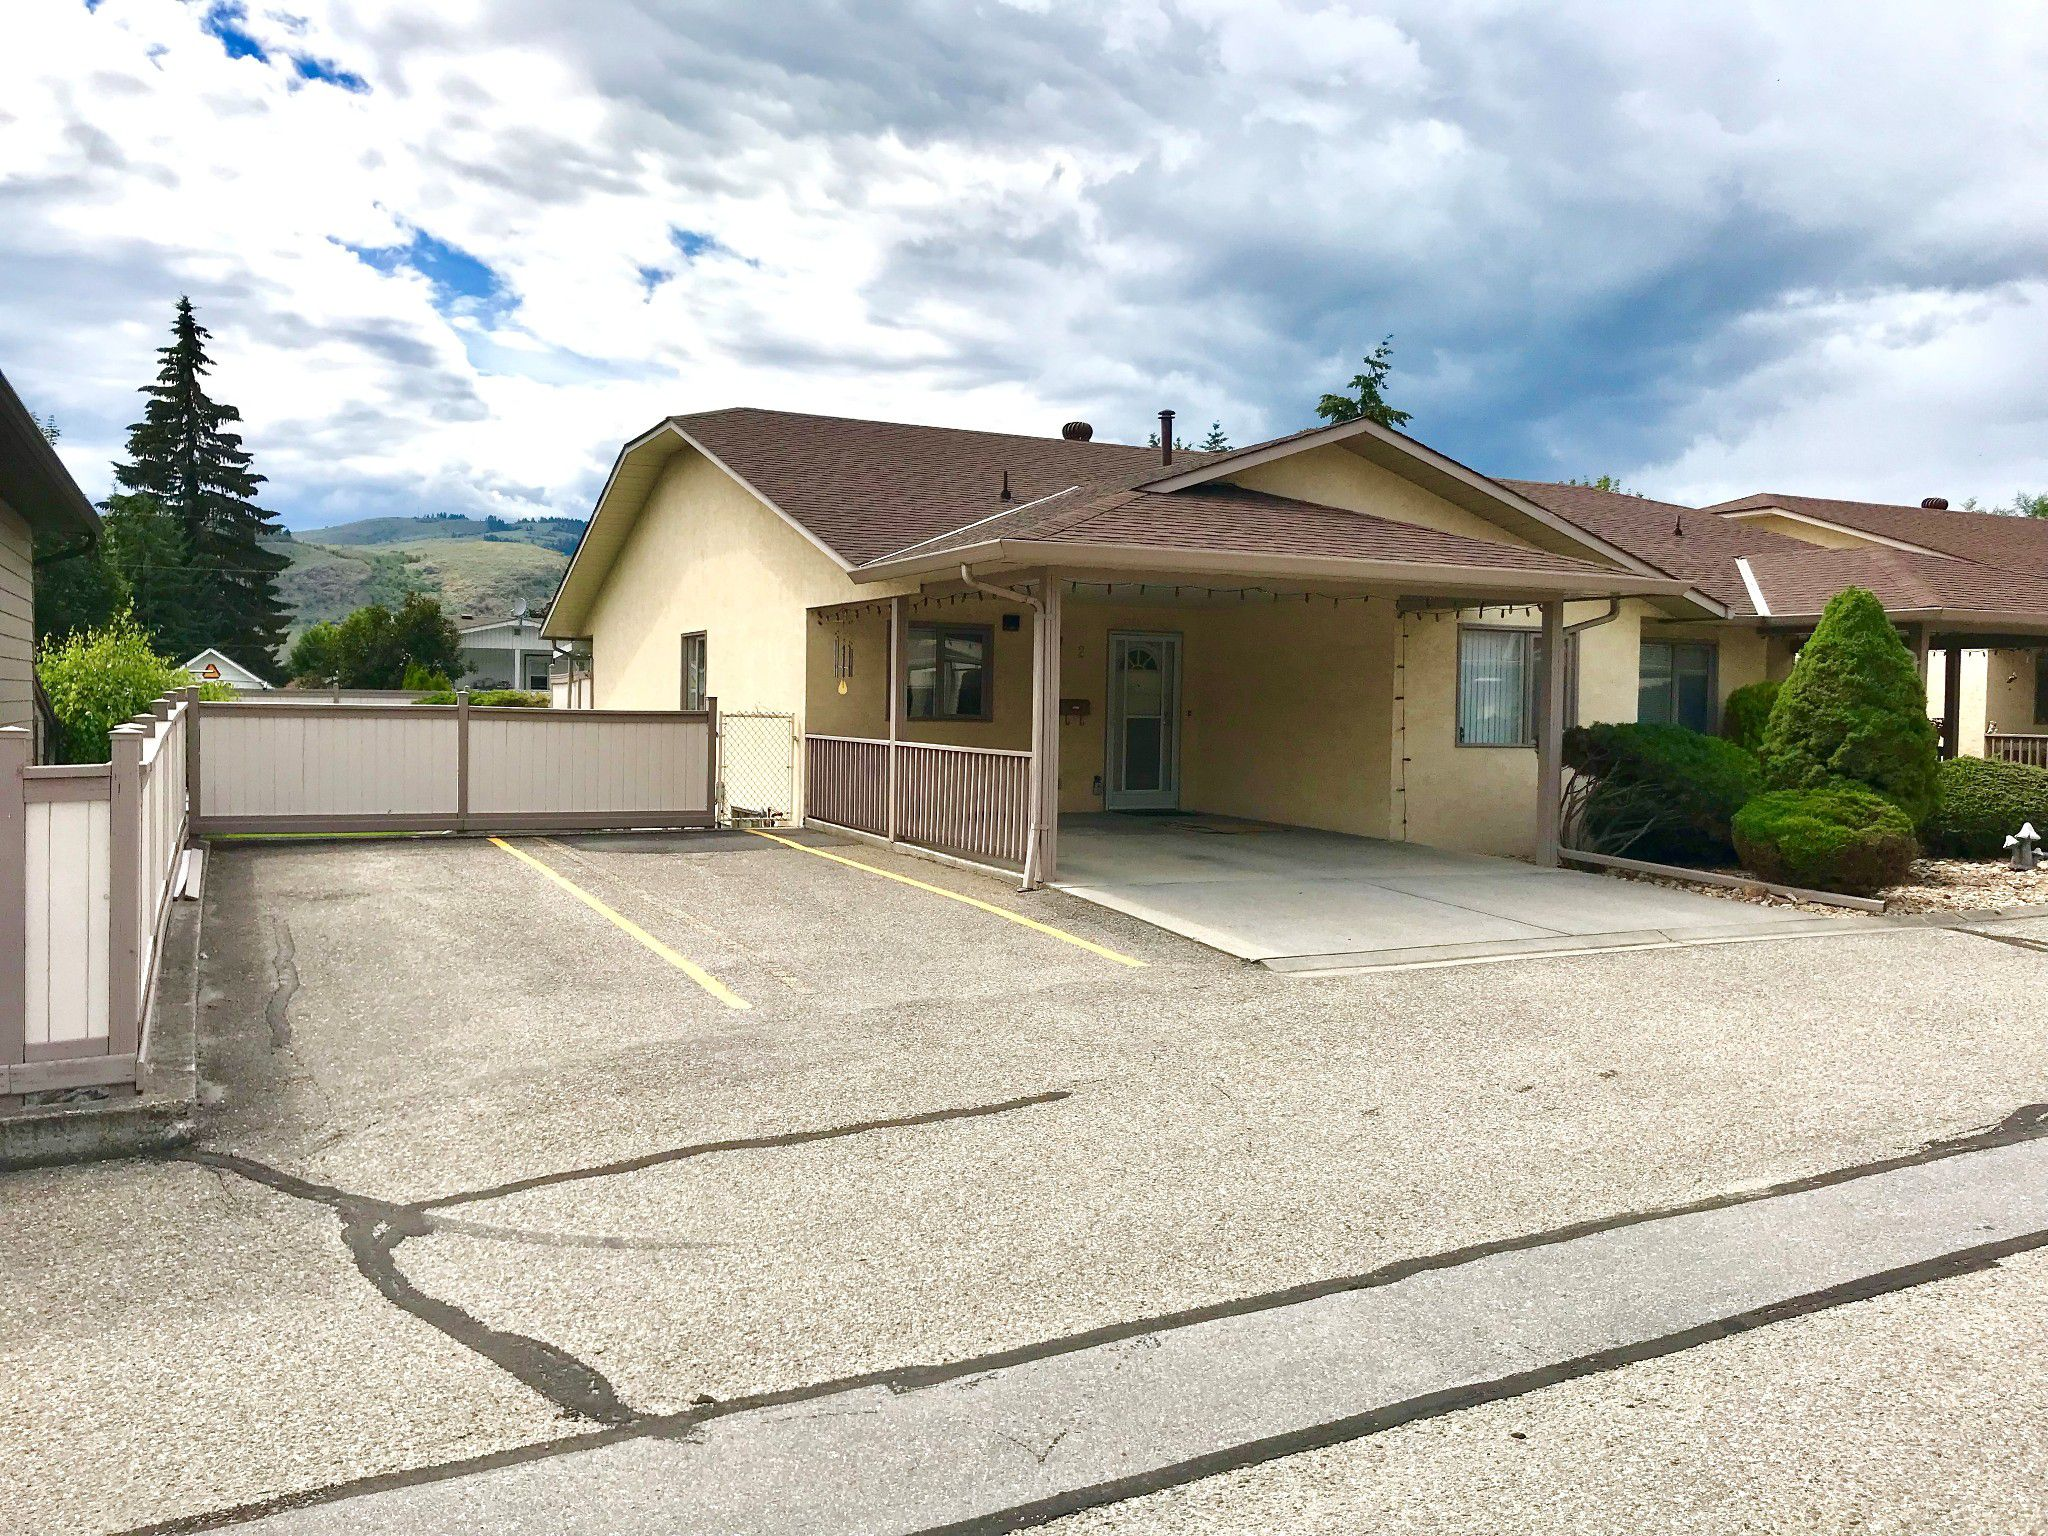 Main Photo: 2 2107 43rd Avenue in Vernon: Harwood House for sale (North Okanagan)  : MLS®# 10163407